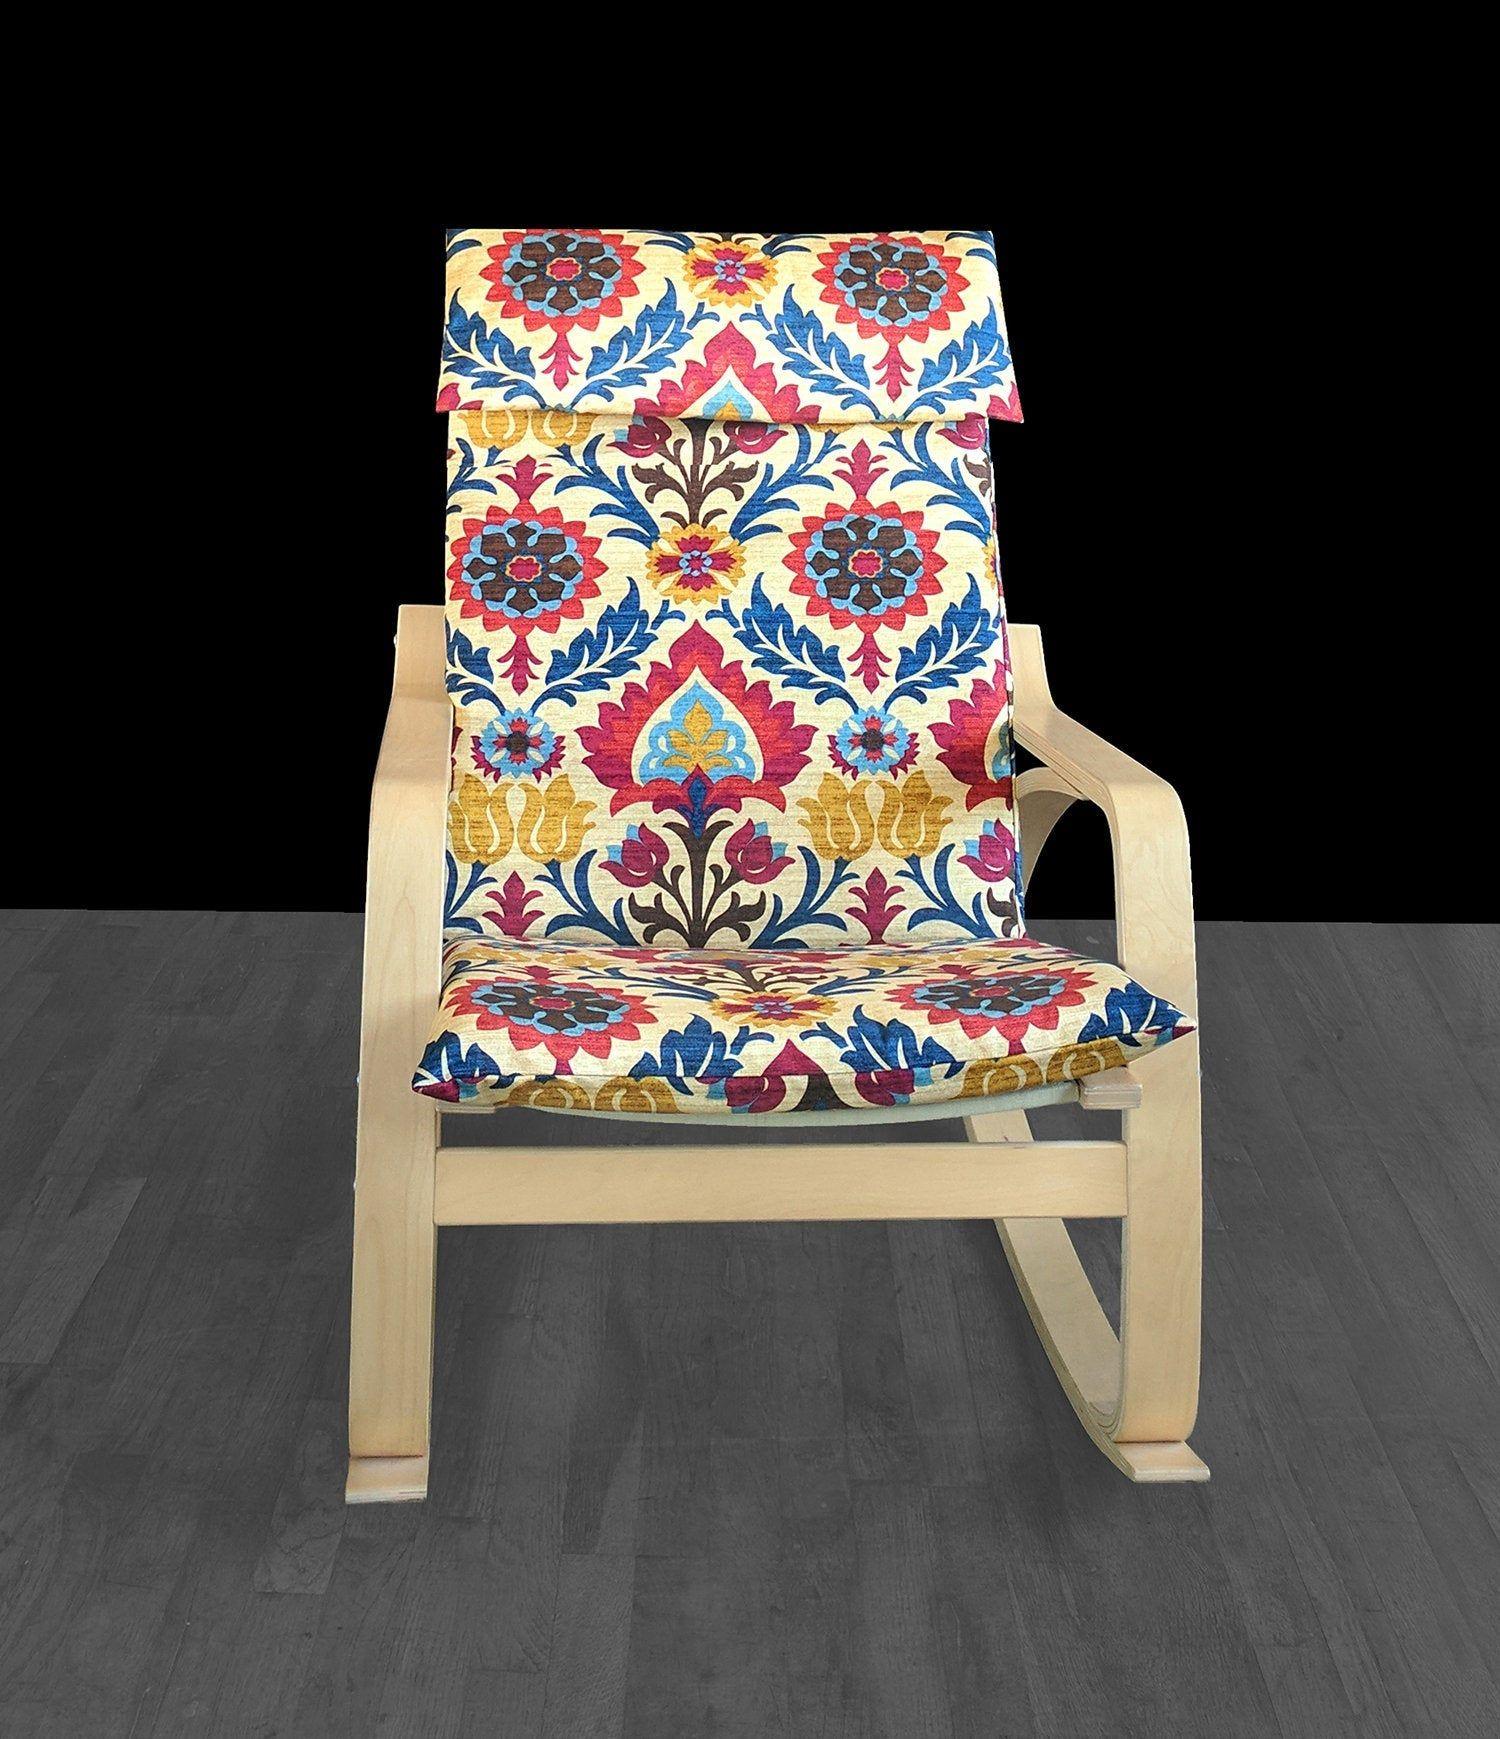 Jewel Tones IKEA POÄNG Cushion Slipcover, Flower Print